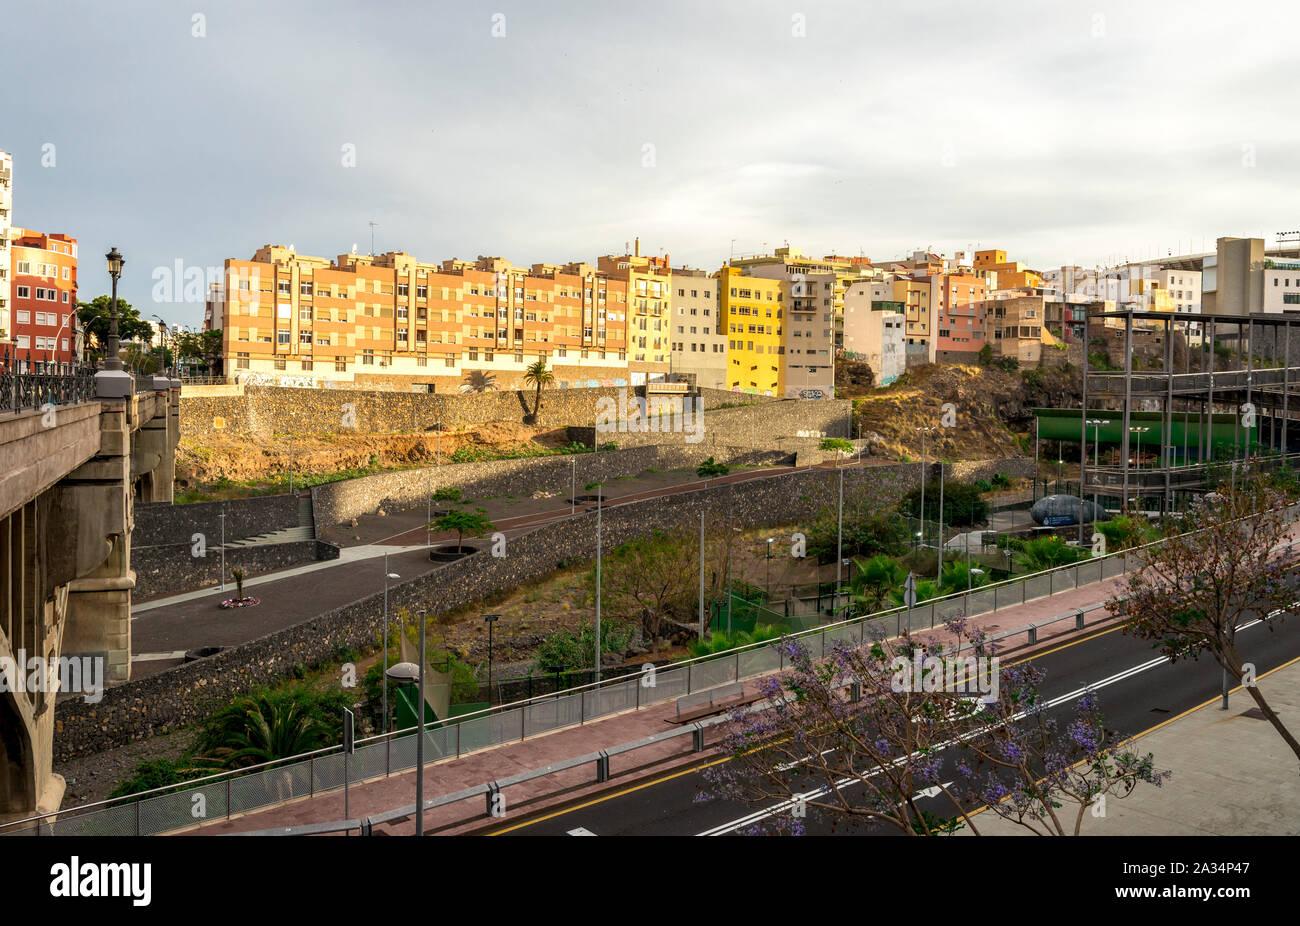 A view from the bridge across Barranco de Santos with dividing the city center of Santa Cruz de Tenerife, Canary Islands, Spain Stock Photo